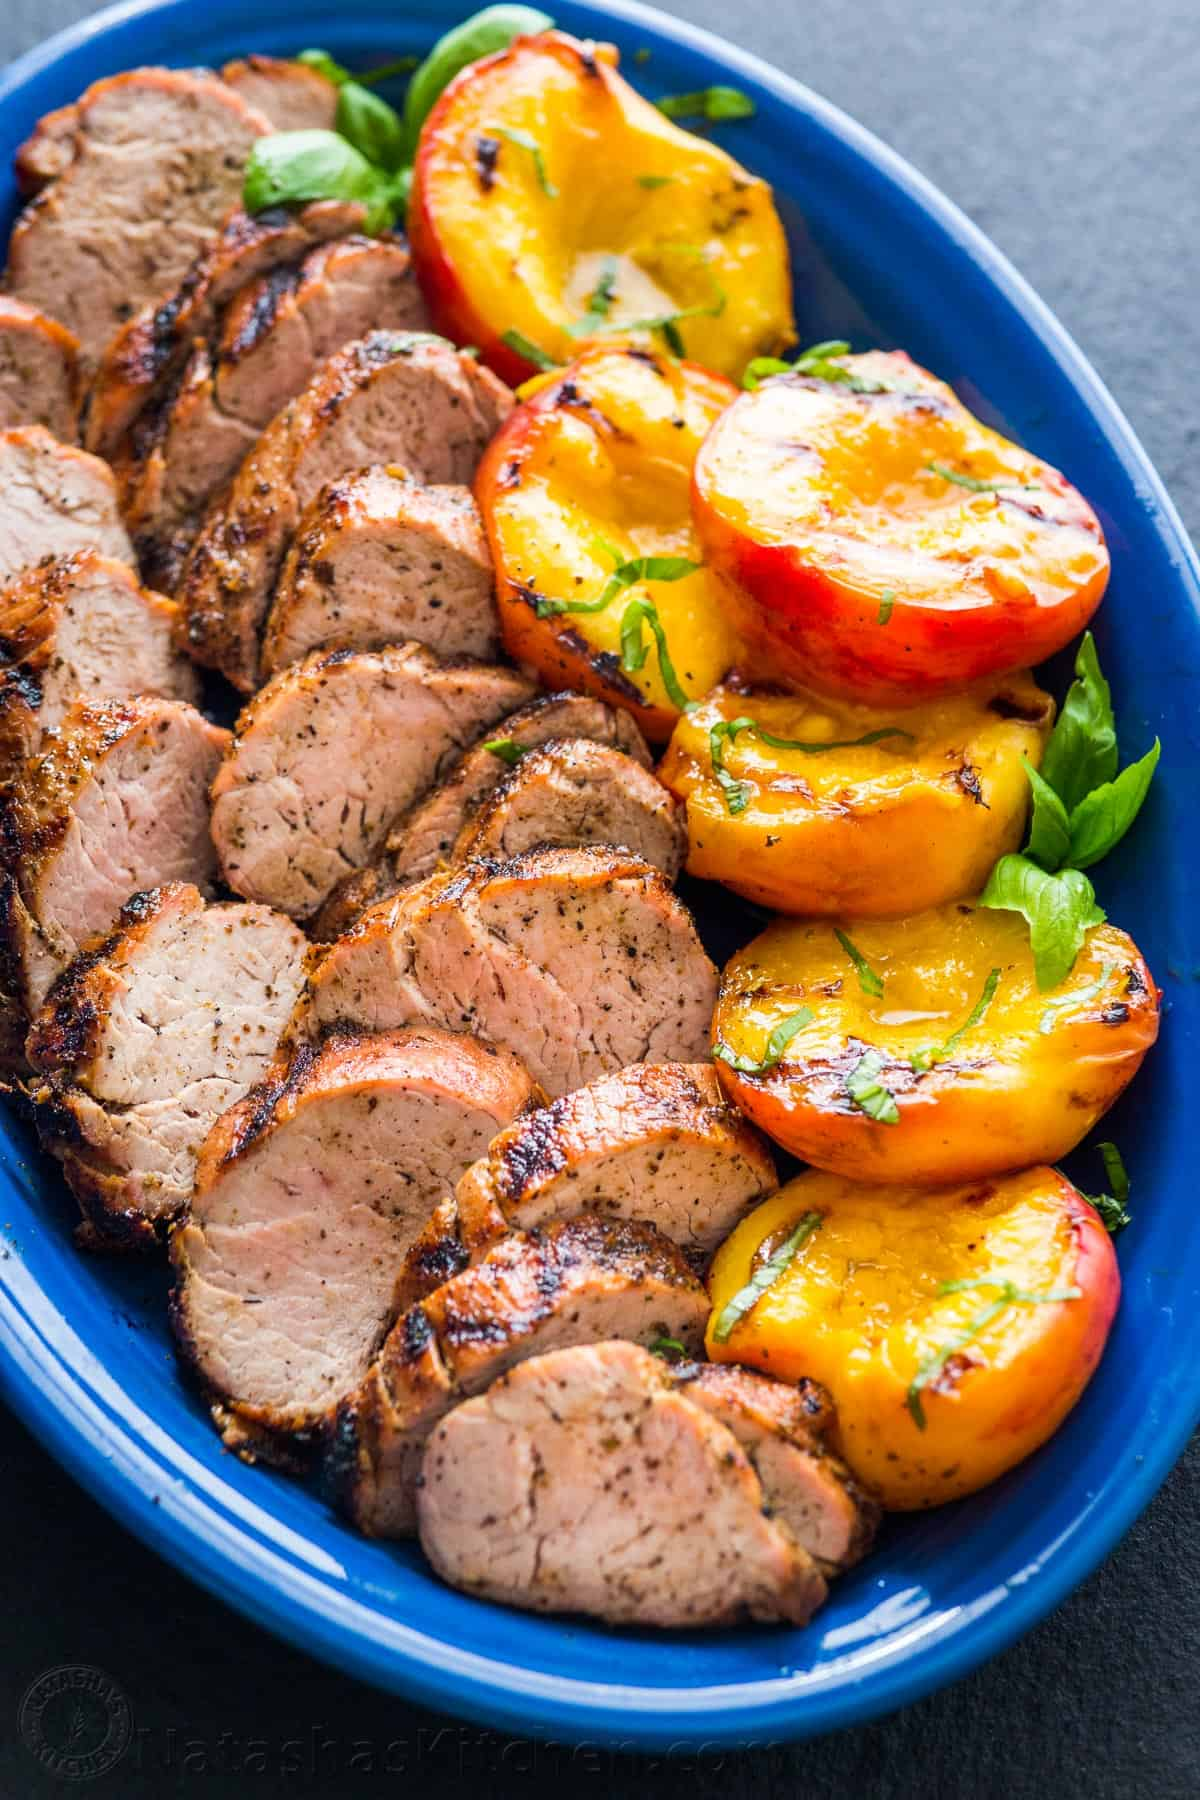 pork tenderloin grilled recipes peaches tender natashaskitchen recipe loin grilling juicy delicious tenderloins recipies inexpensive flavorful cooking effort meal fancy